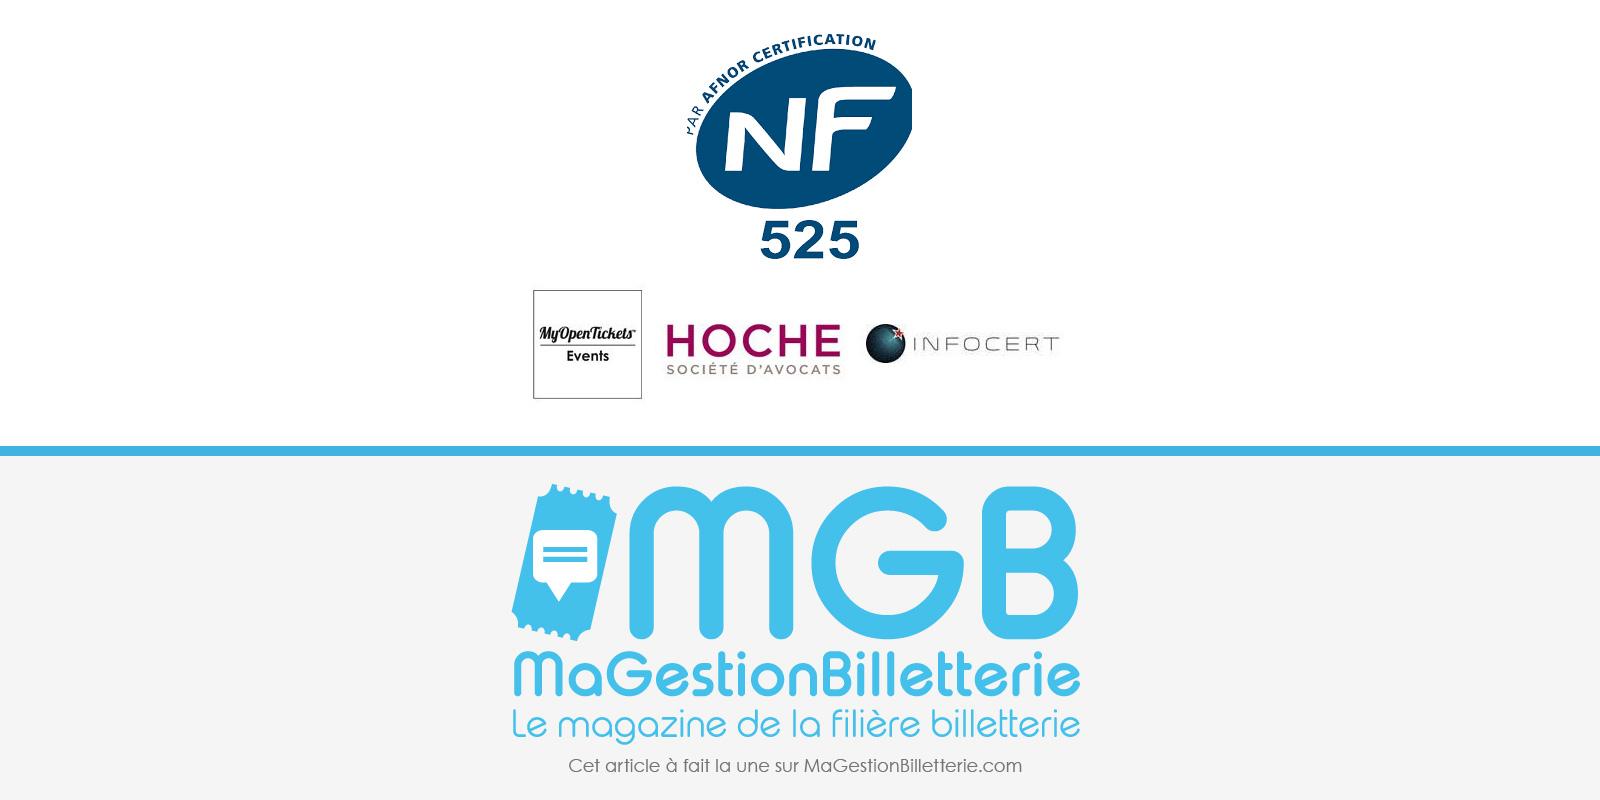 nf525-mot-infocert-une6